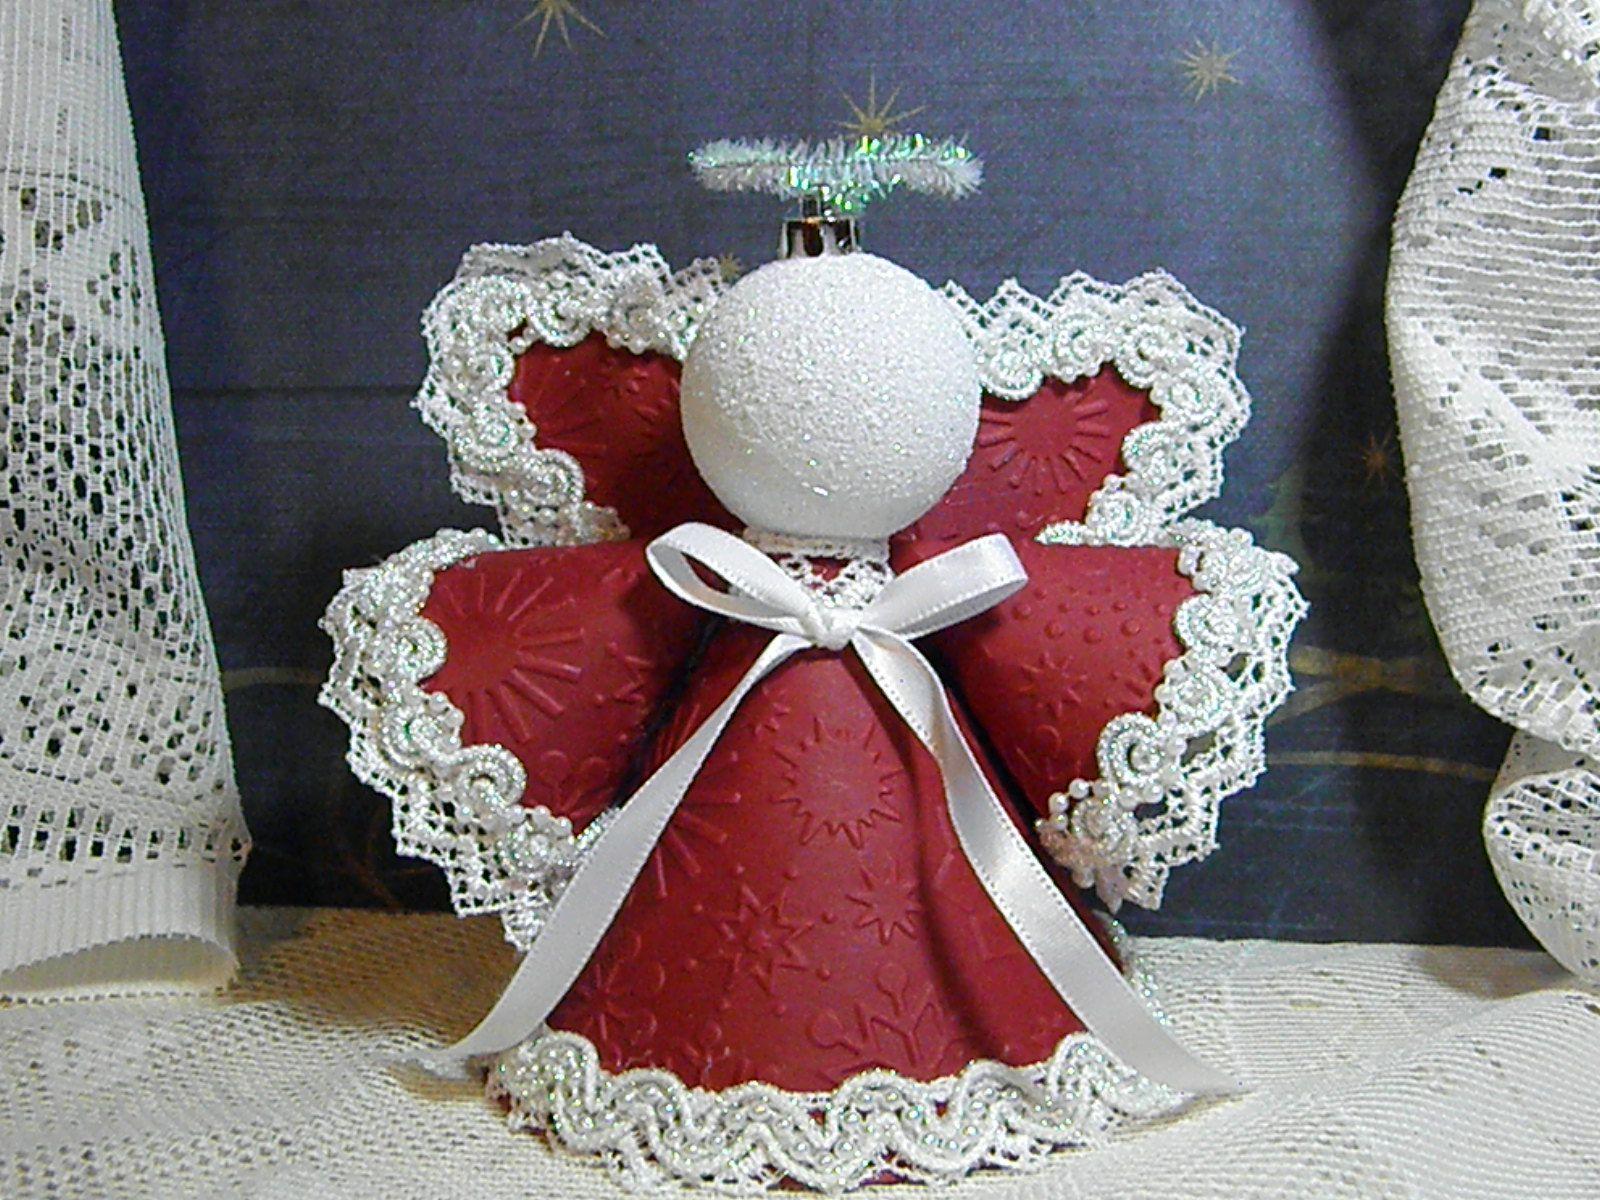 Homemade angel ornaments httpmmgirlstampinspot homemade angel ornaments httpmmgirlstampinspot jeuxipadfo Images